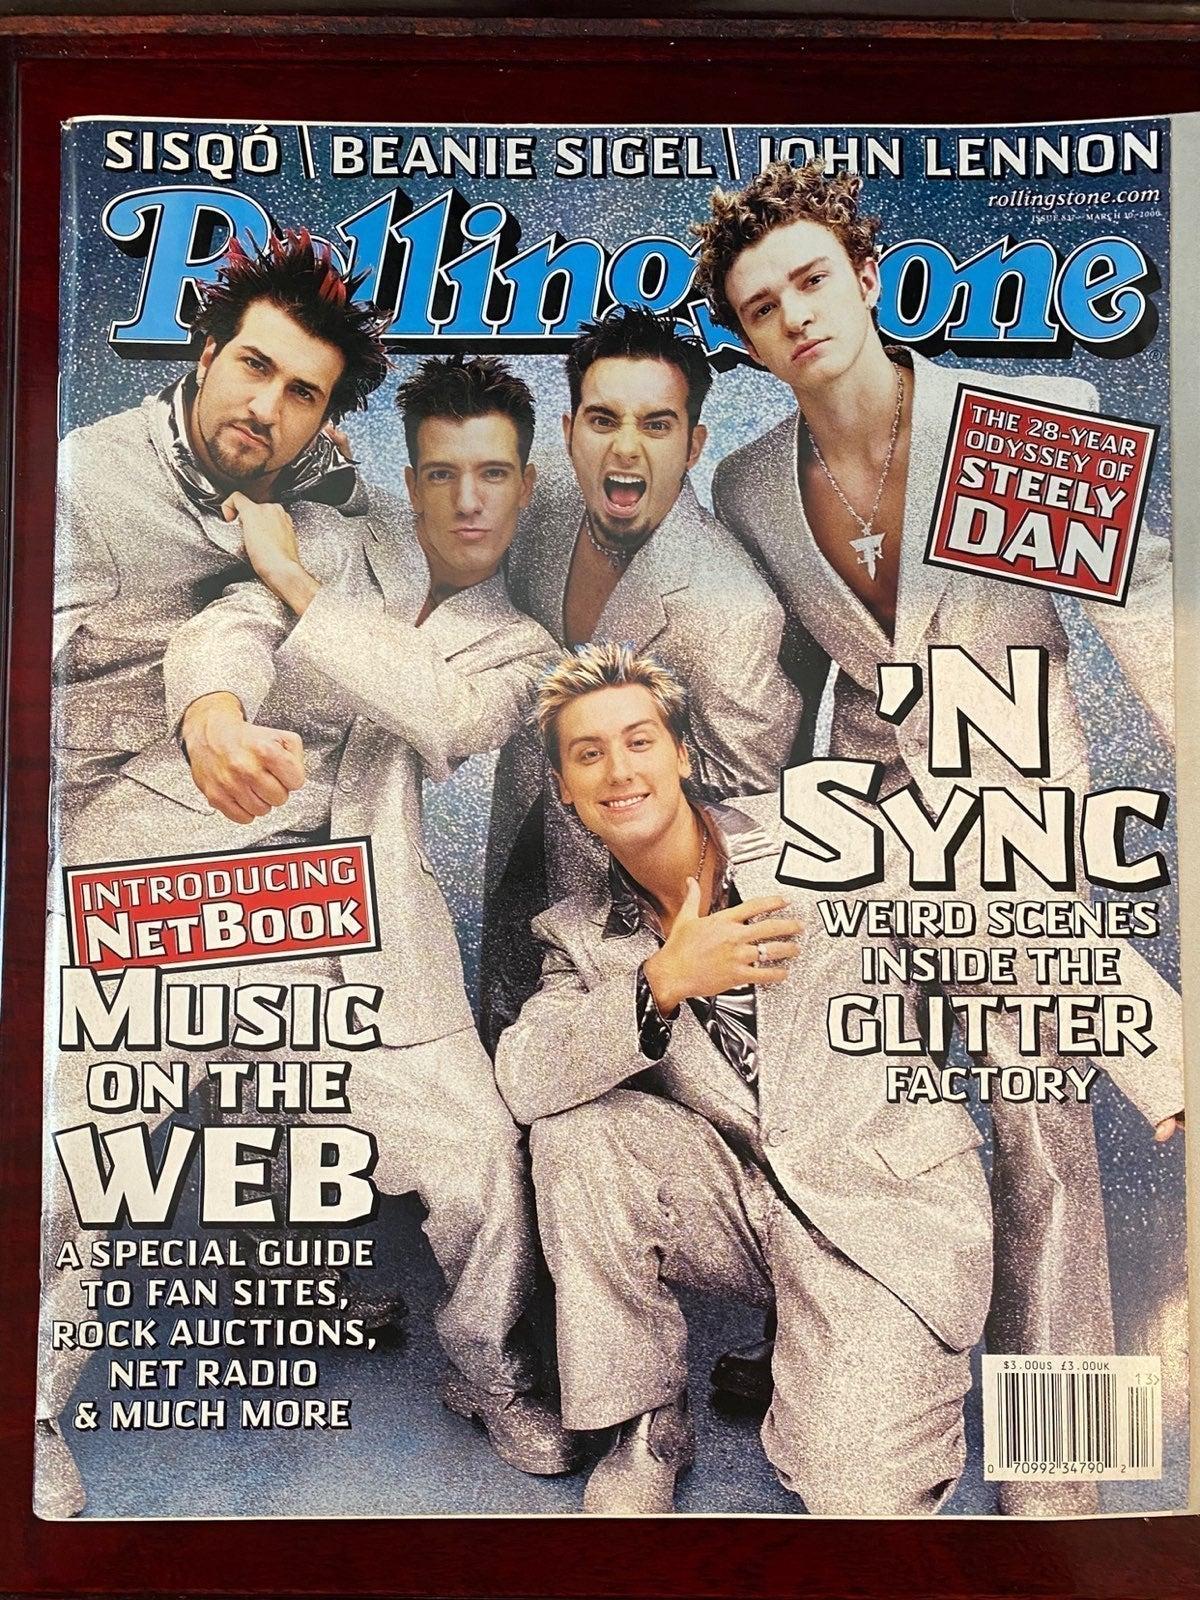 NSYNC's 1st Rollingstone Cover